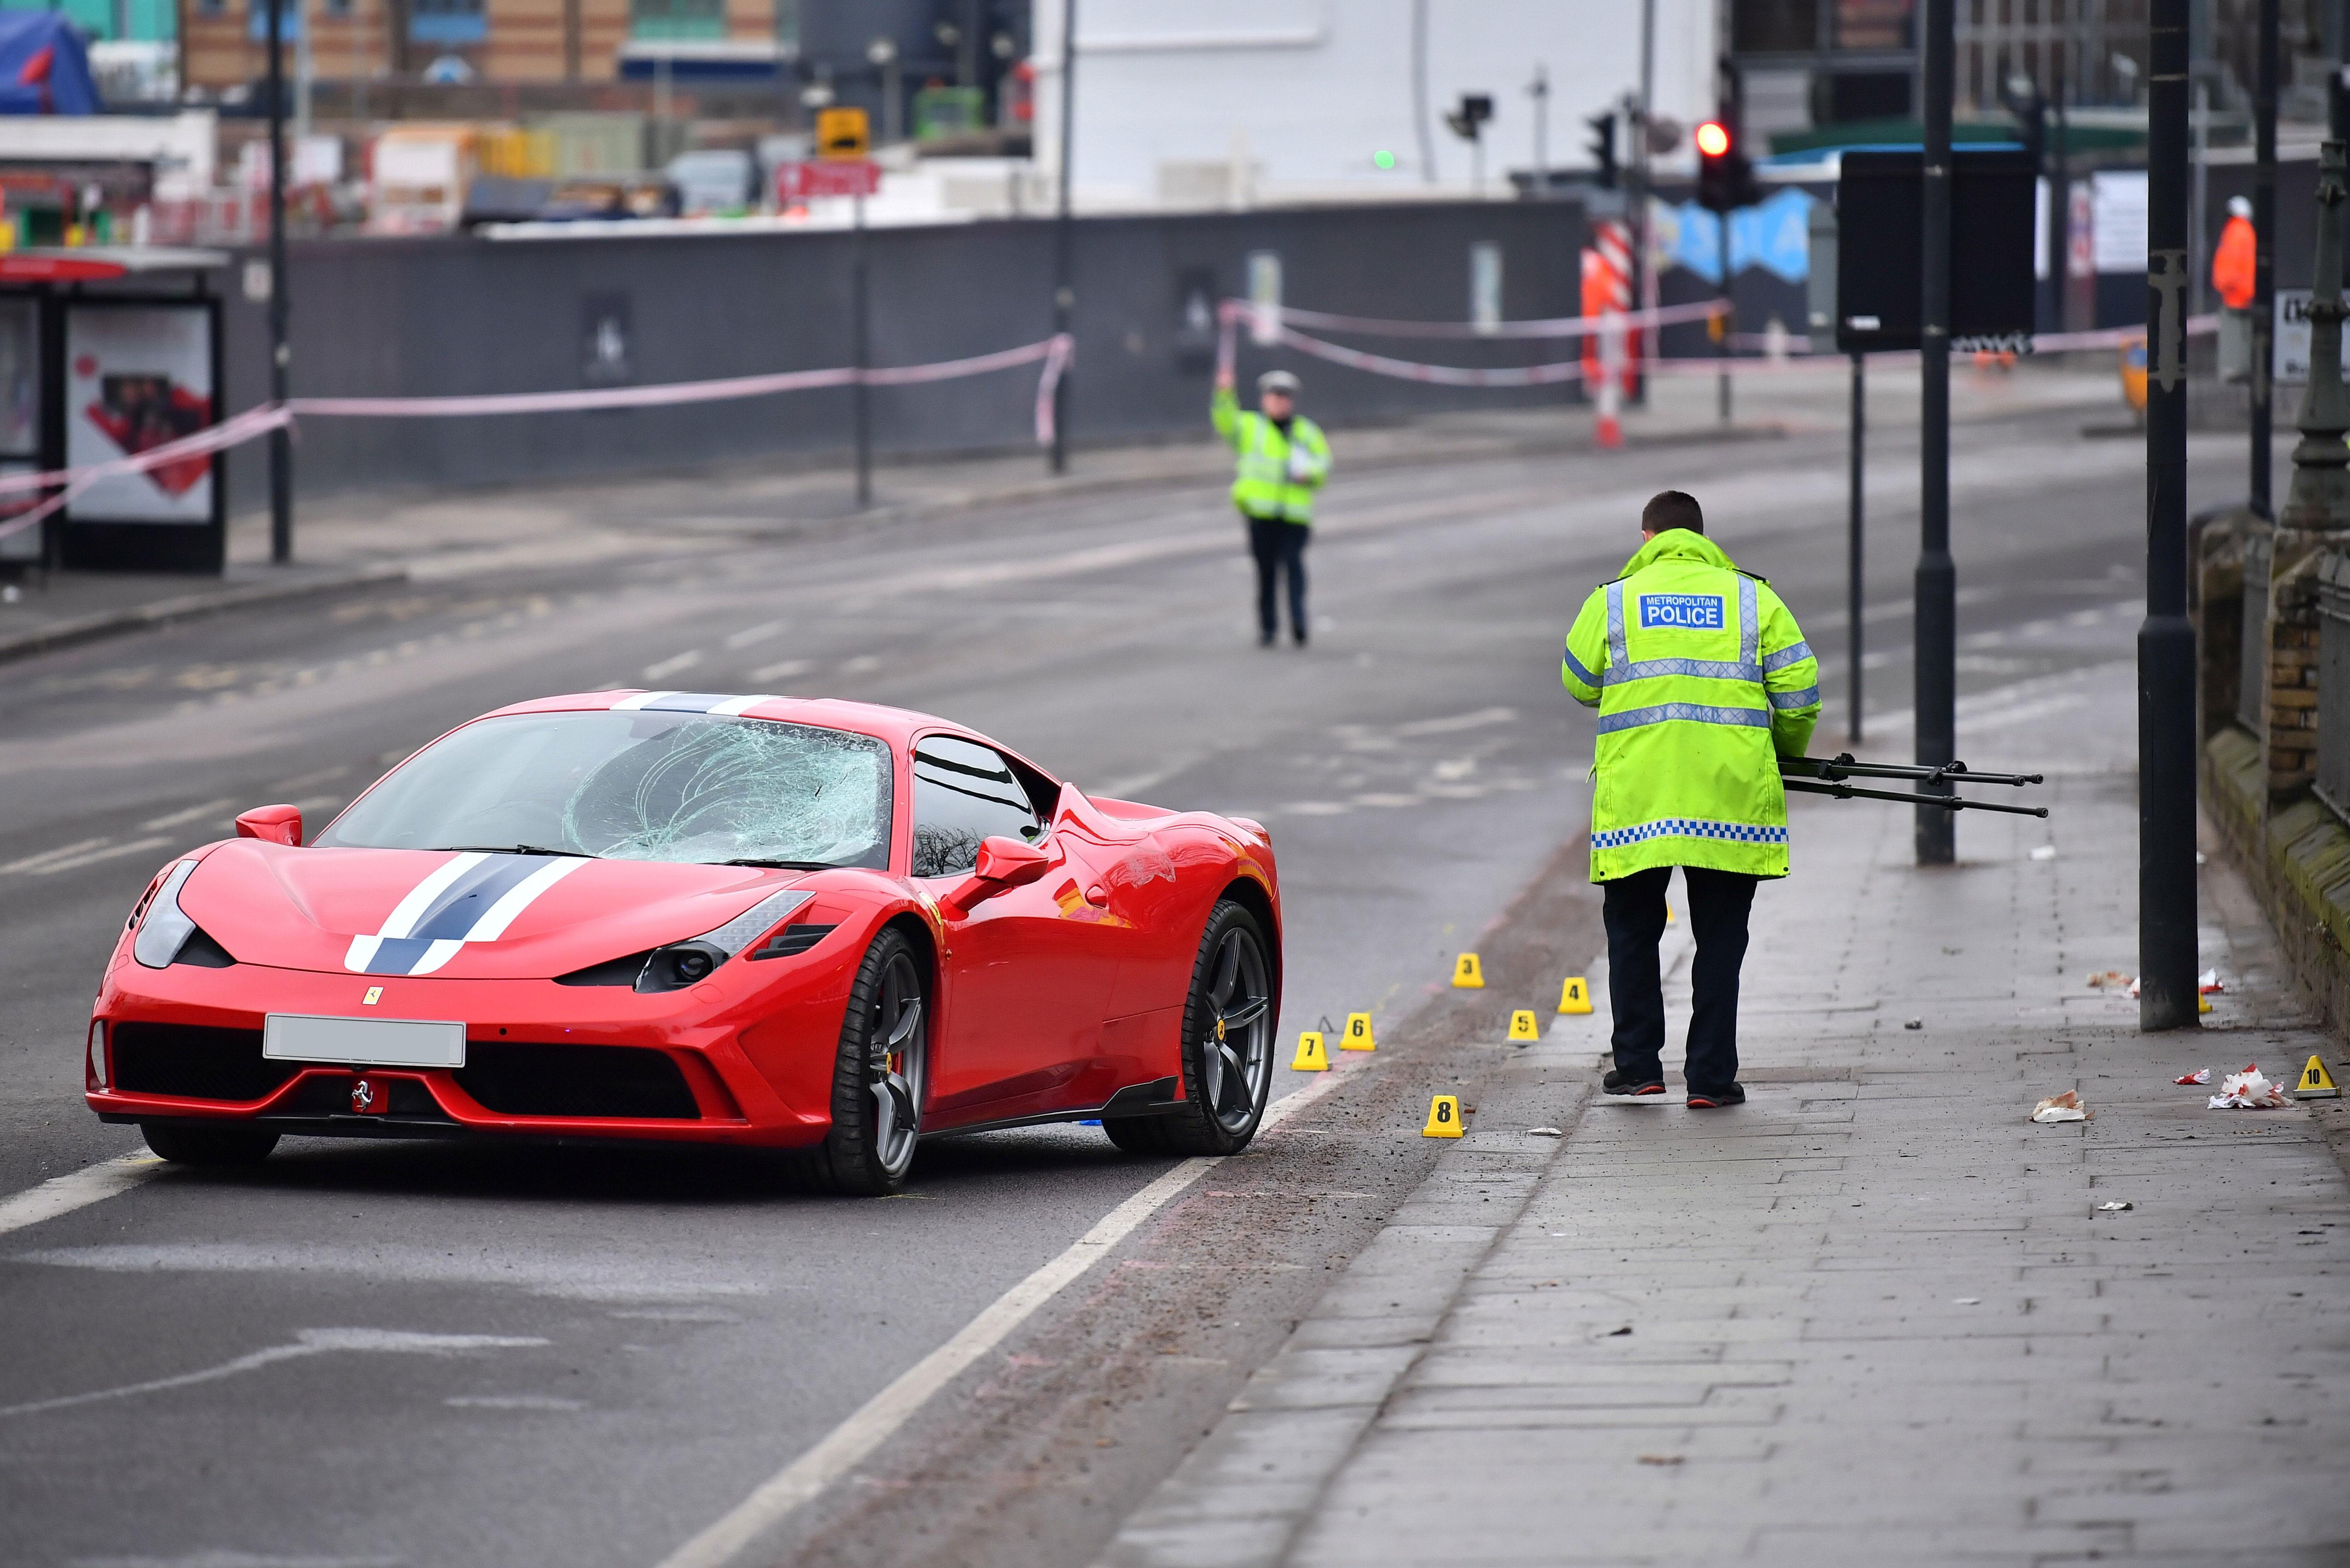 Battersea Ferrari collision